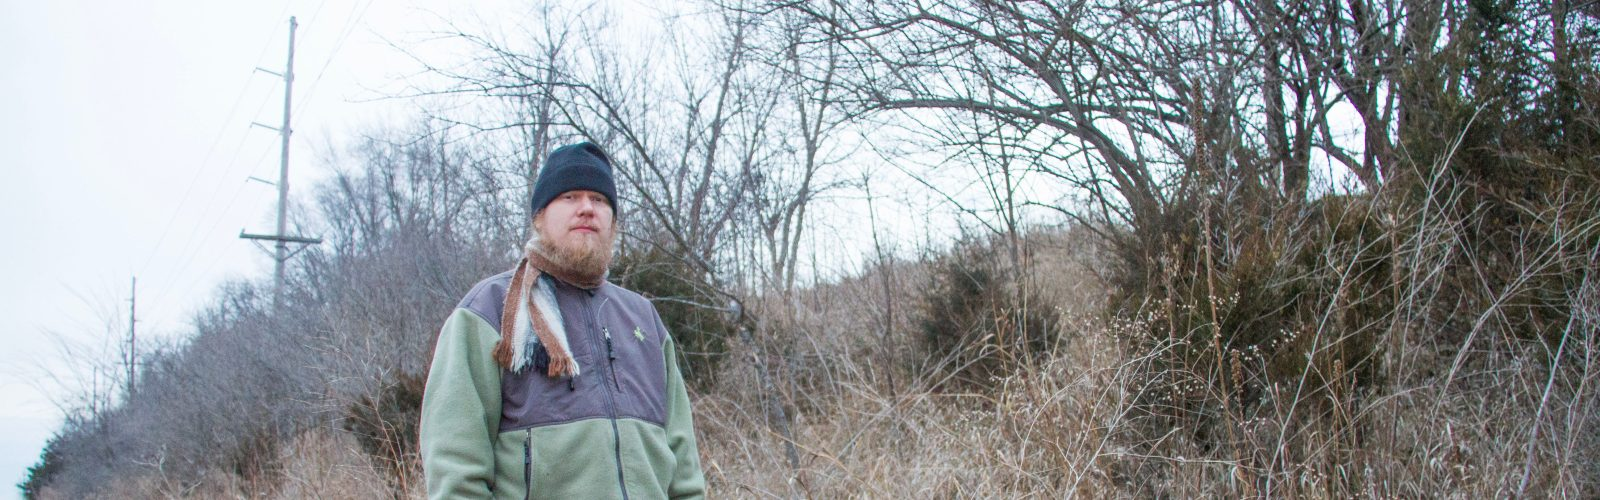 Landowner, Electric Utility, and County Conservation Partner in Oak Savanna Restoration